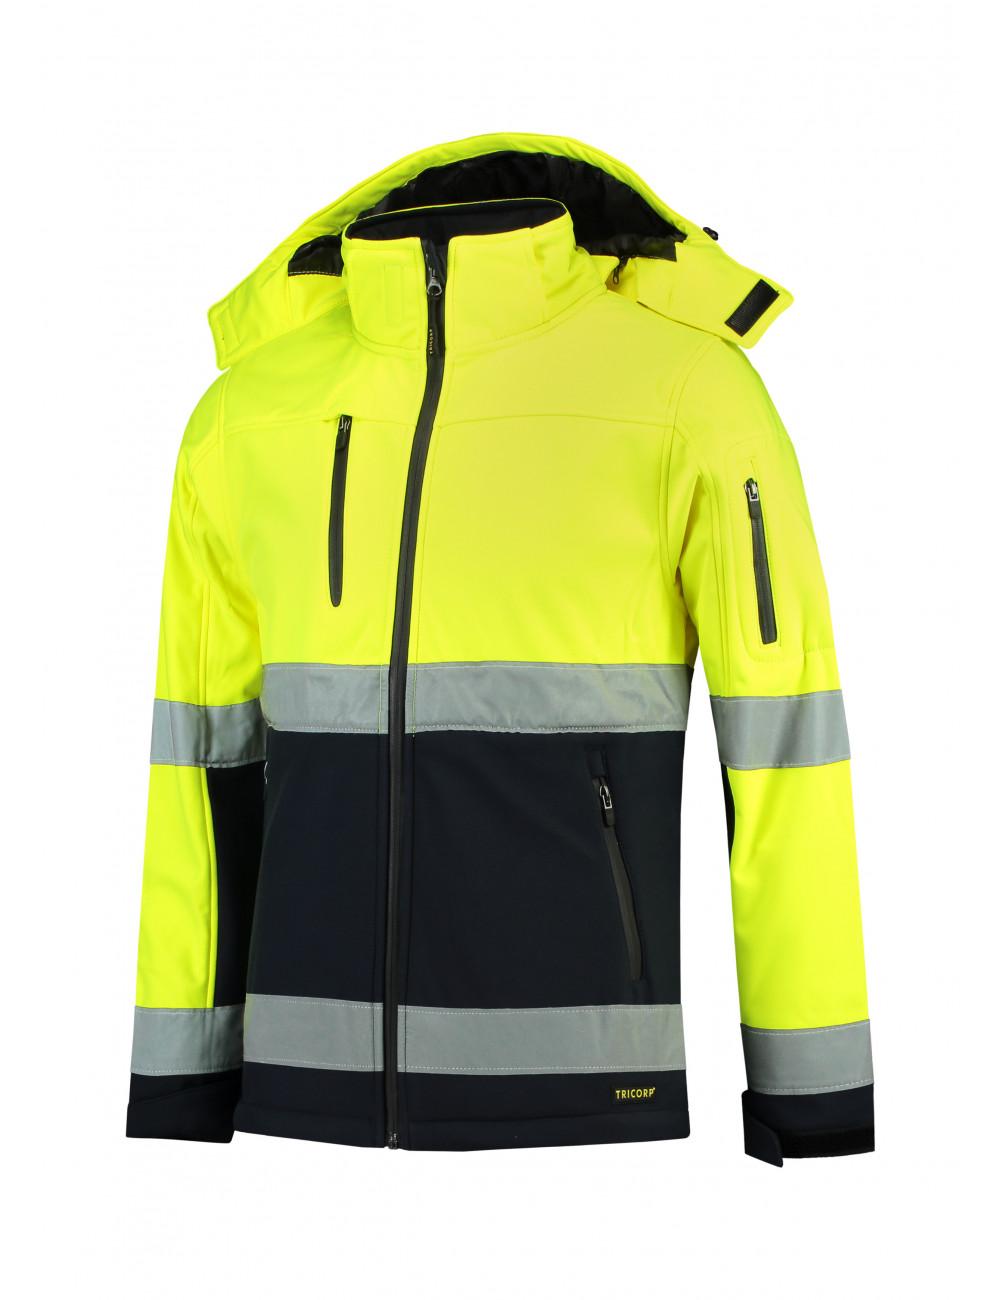 Adler TRICORP Softshell kurtka unisex Bi-color EN ISO 20471 Softshell T52 fluorescencyjny żółty